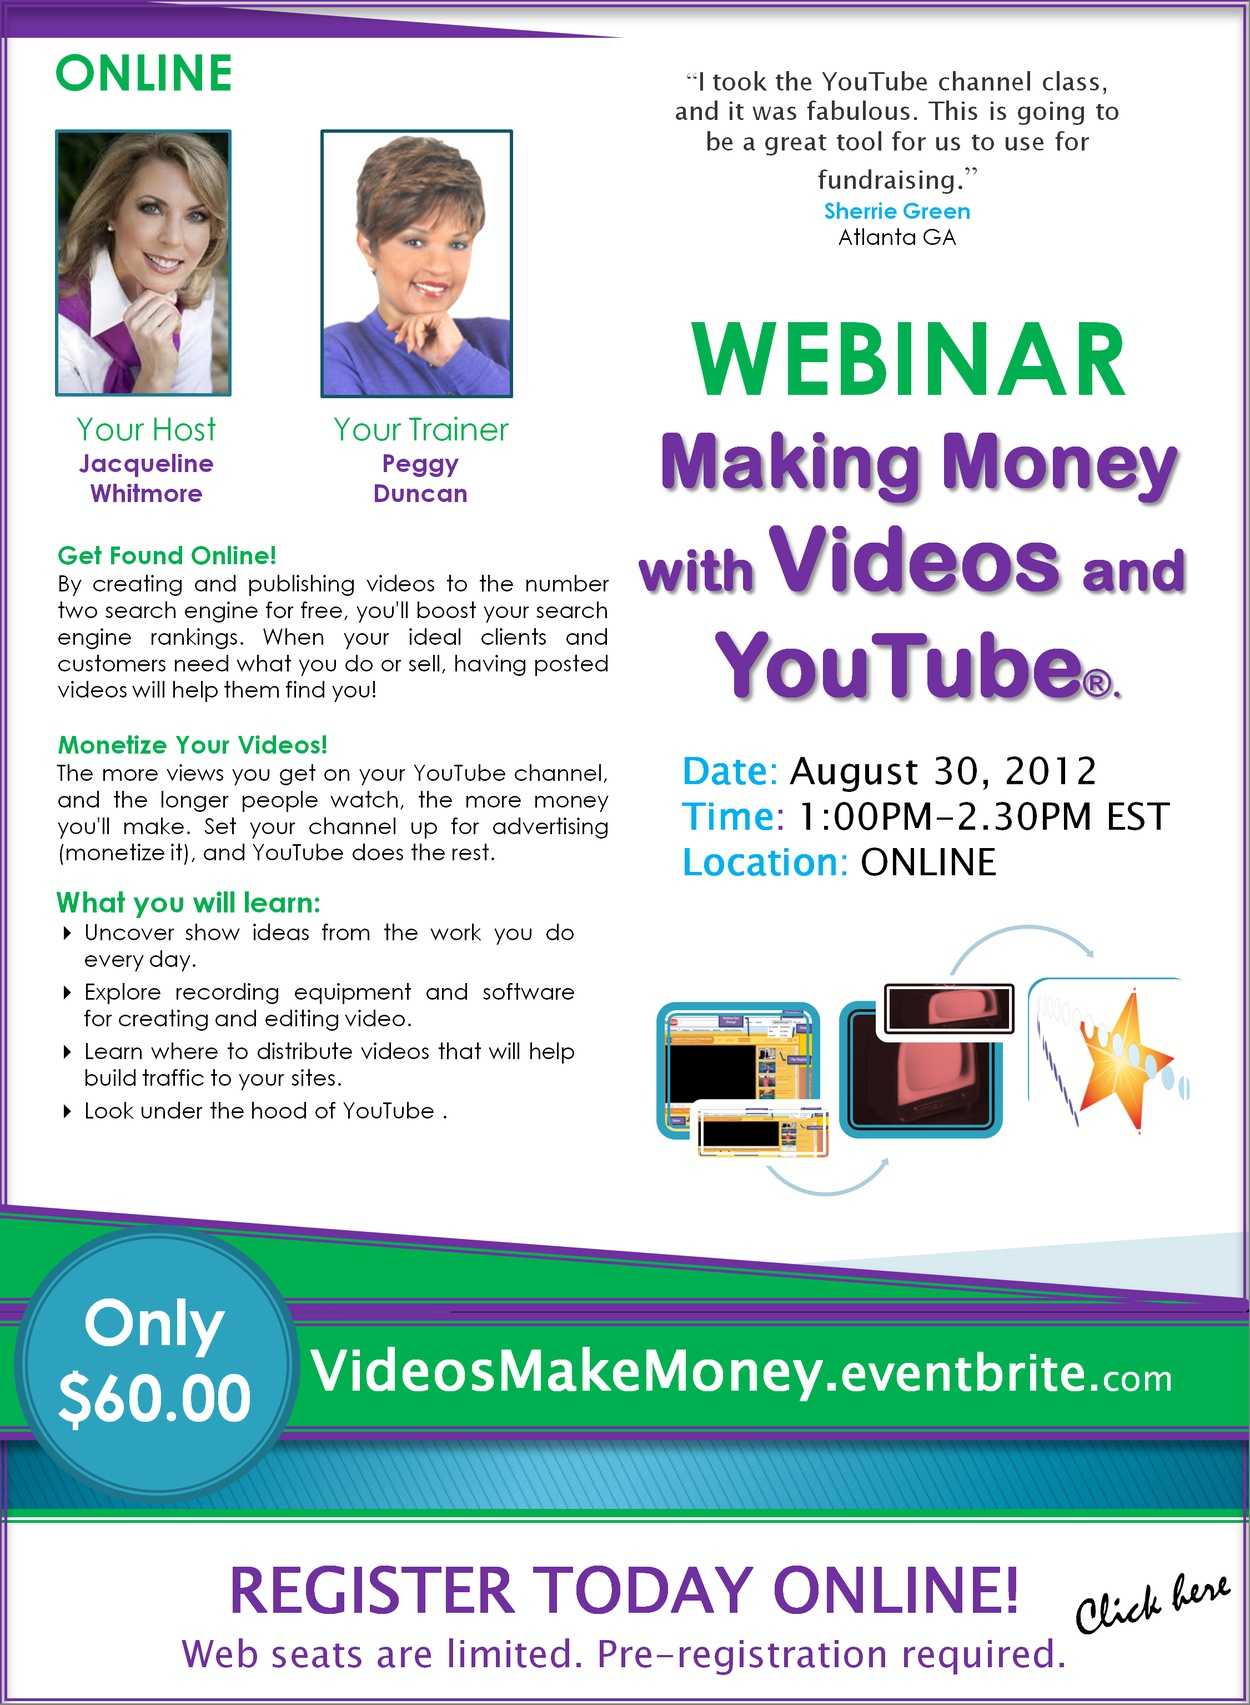 Webinar: Videos and YouTube Make Money